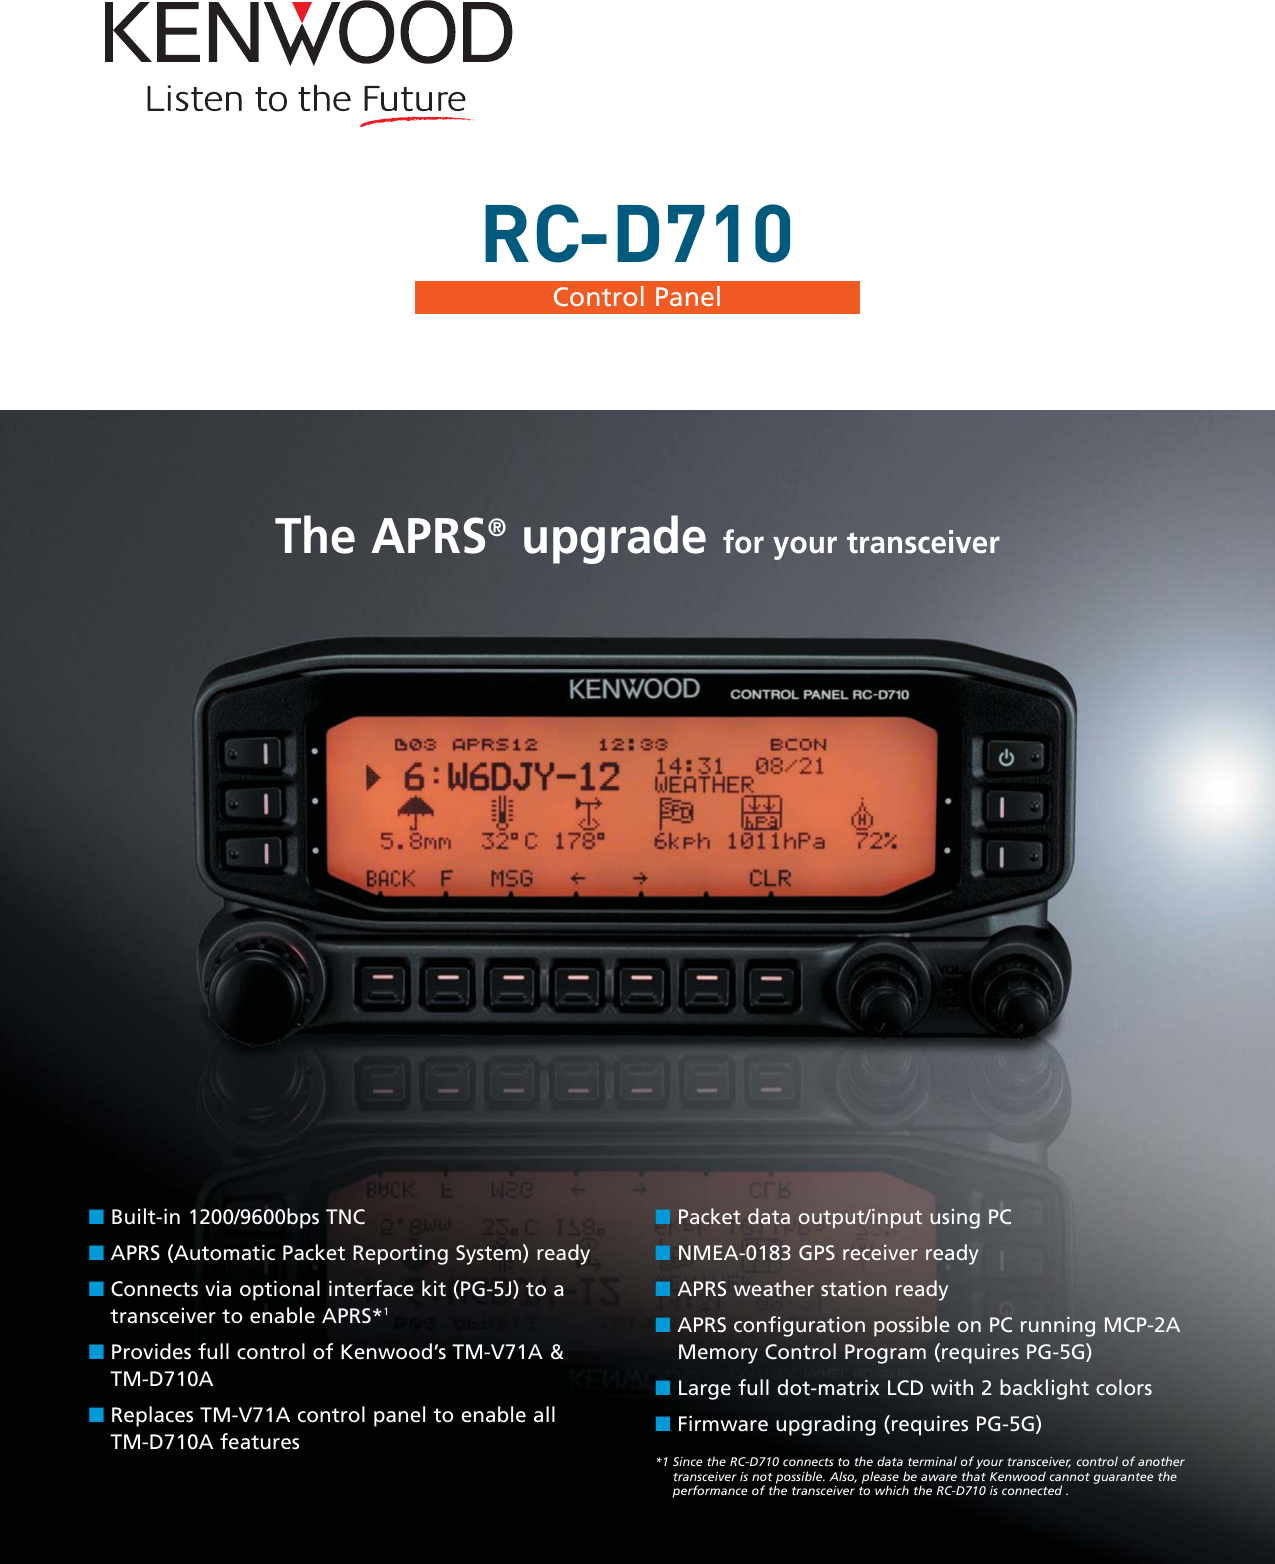 Kenwood RC D710 Rc_d710_k User Manual To The A4fee24b b08b